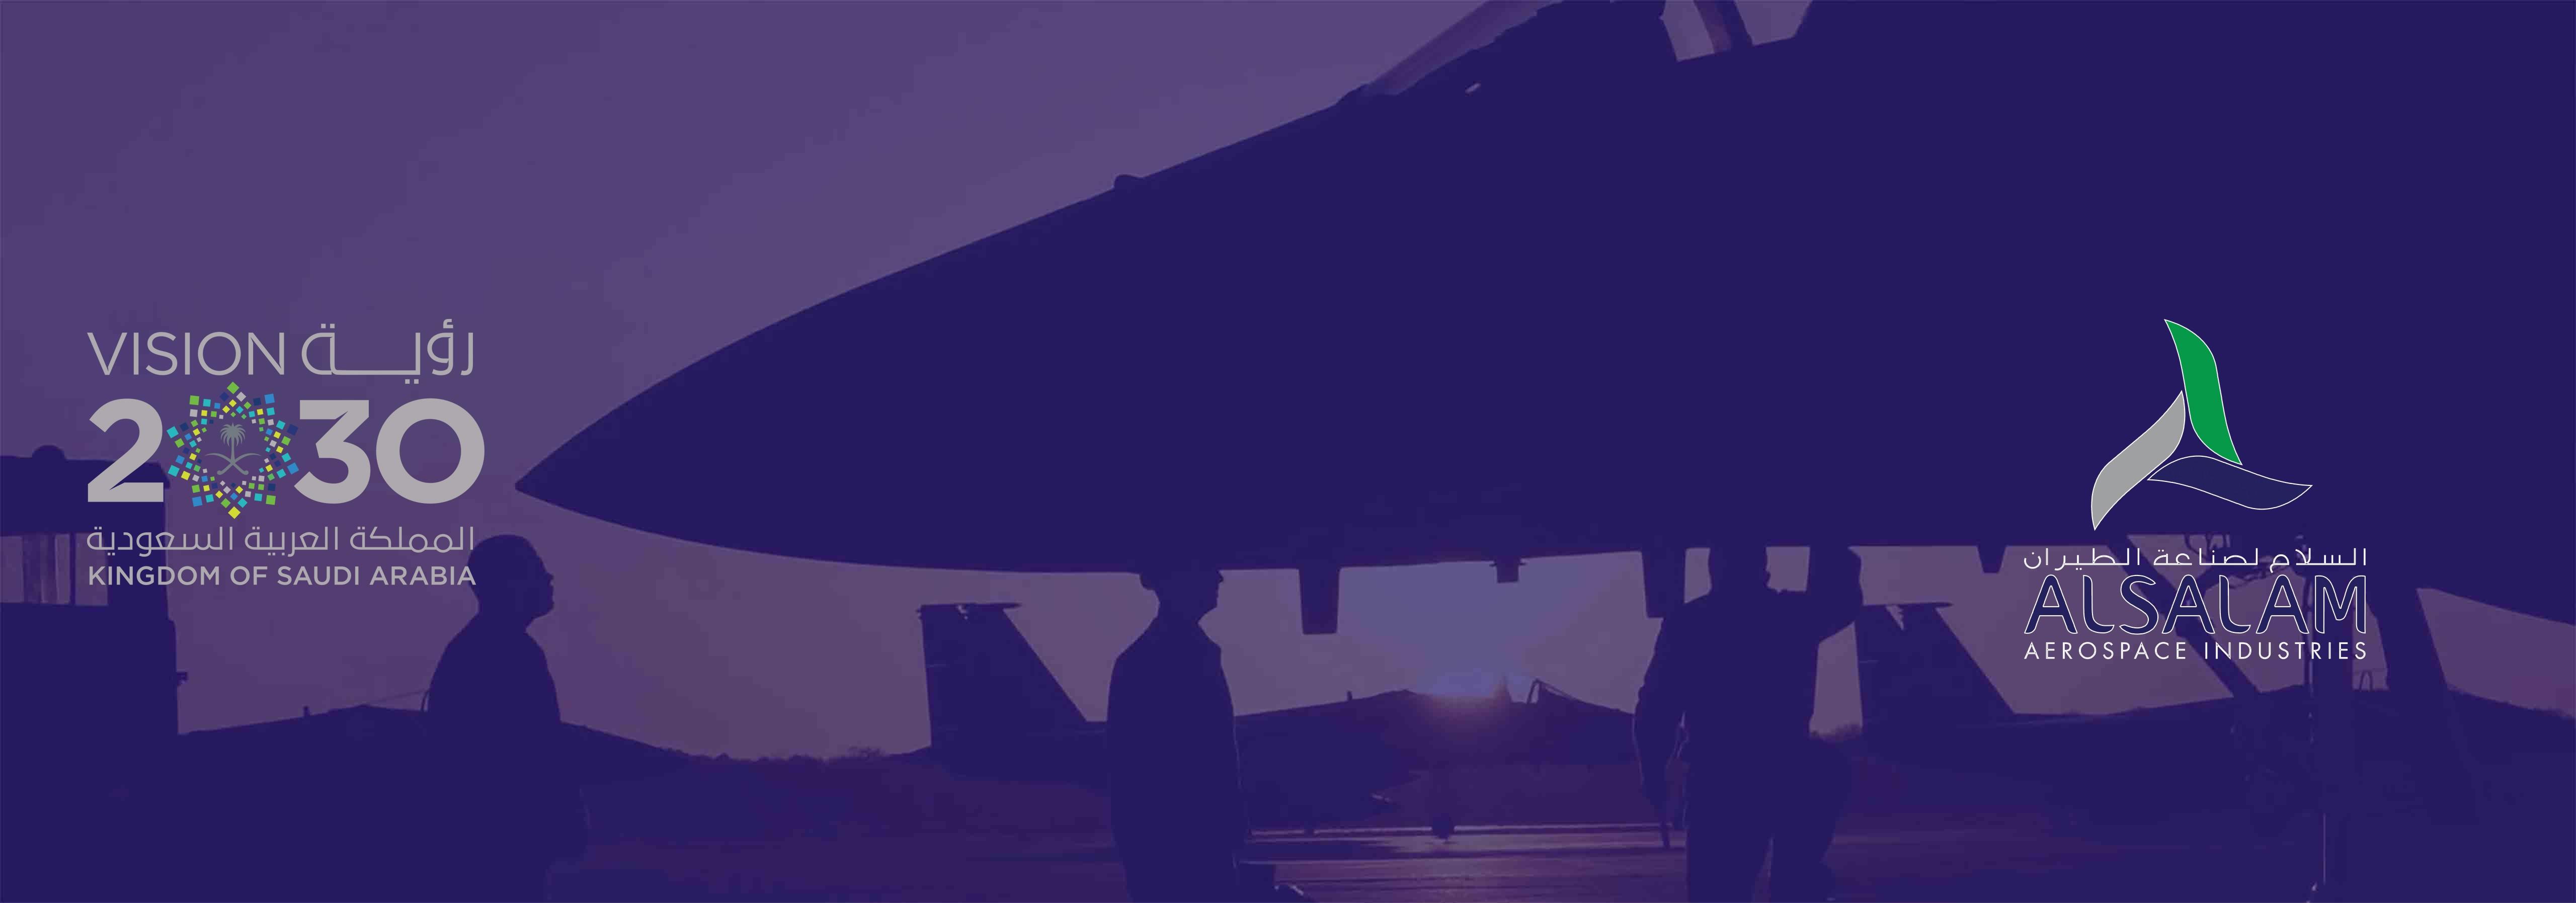 Alsalam Aerospace Industries | LinkedIn